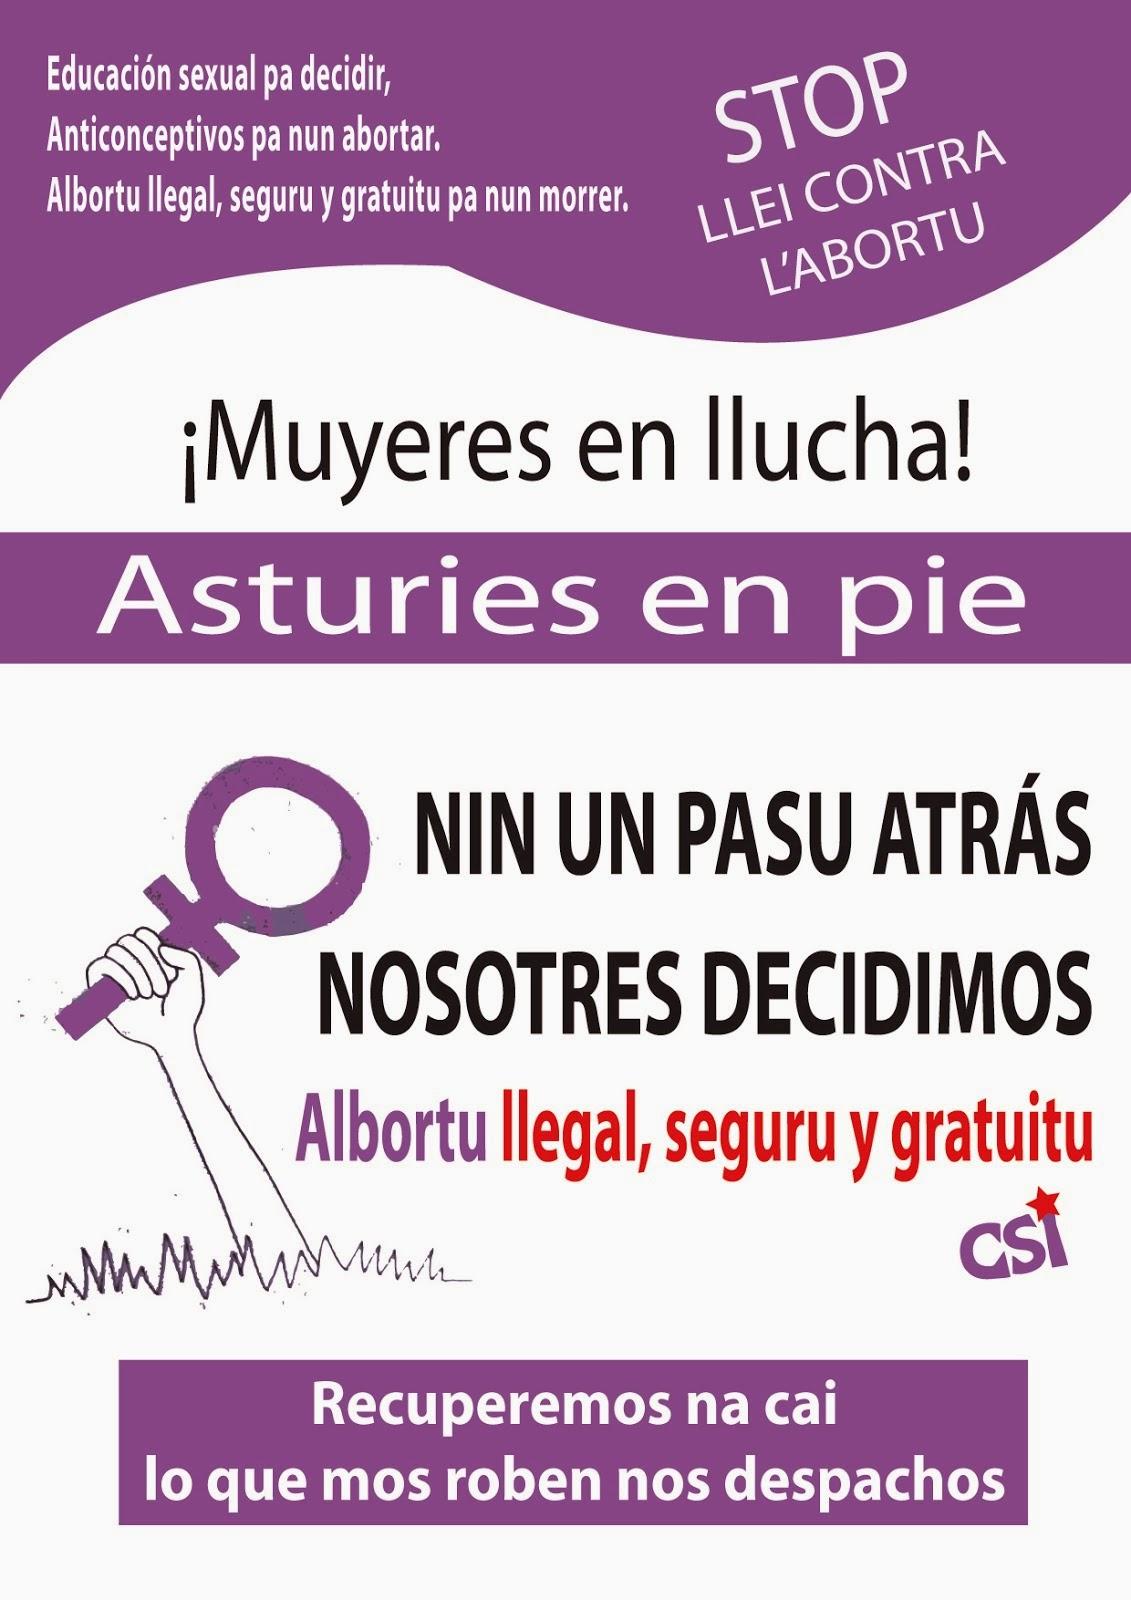 STOP Llei contra l'abortu